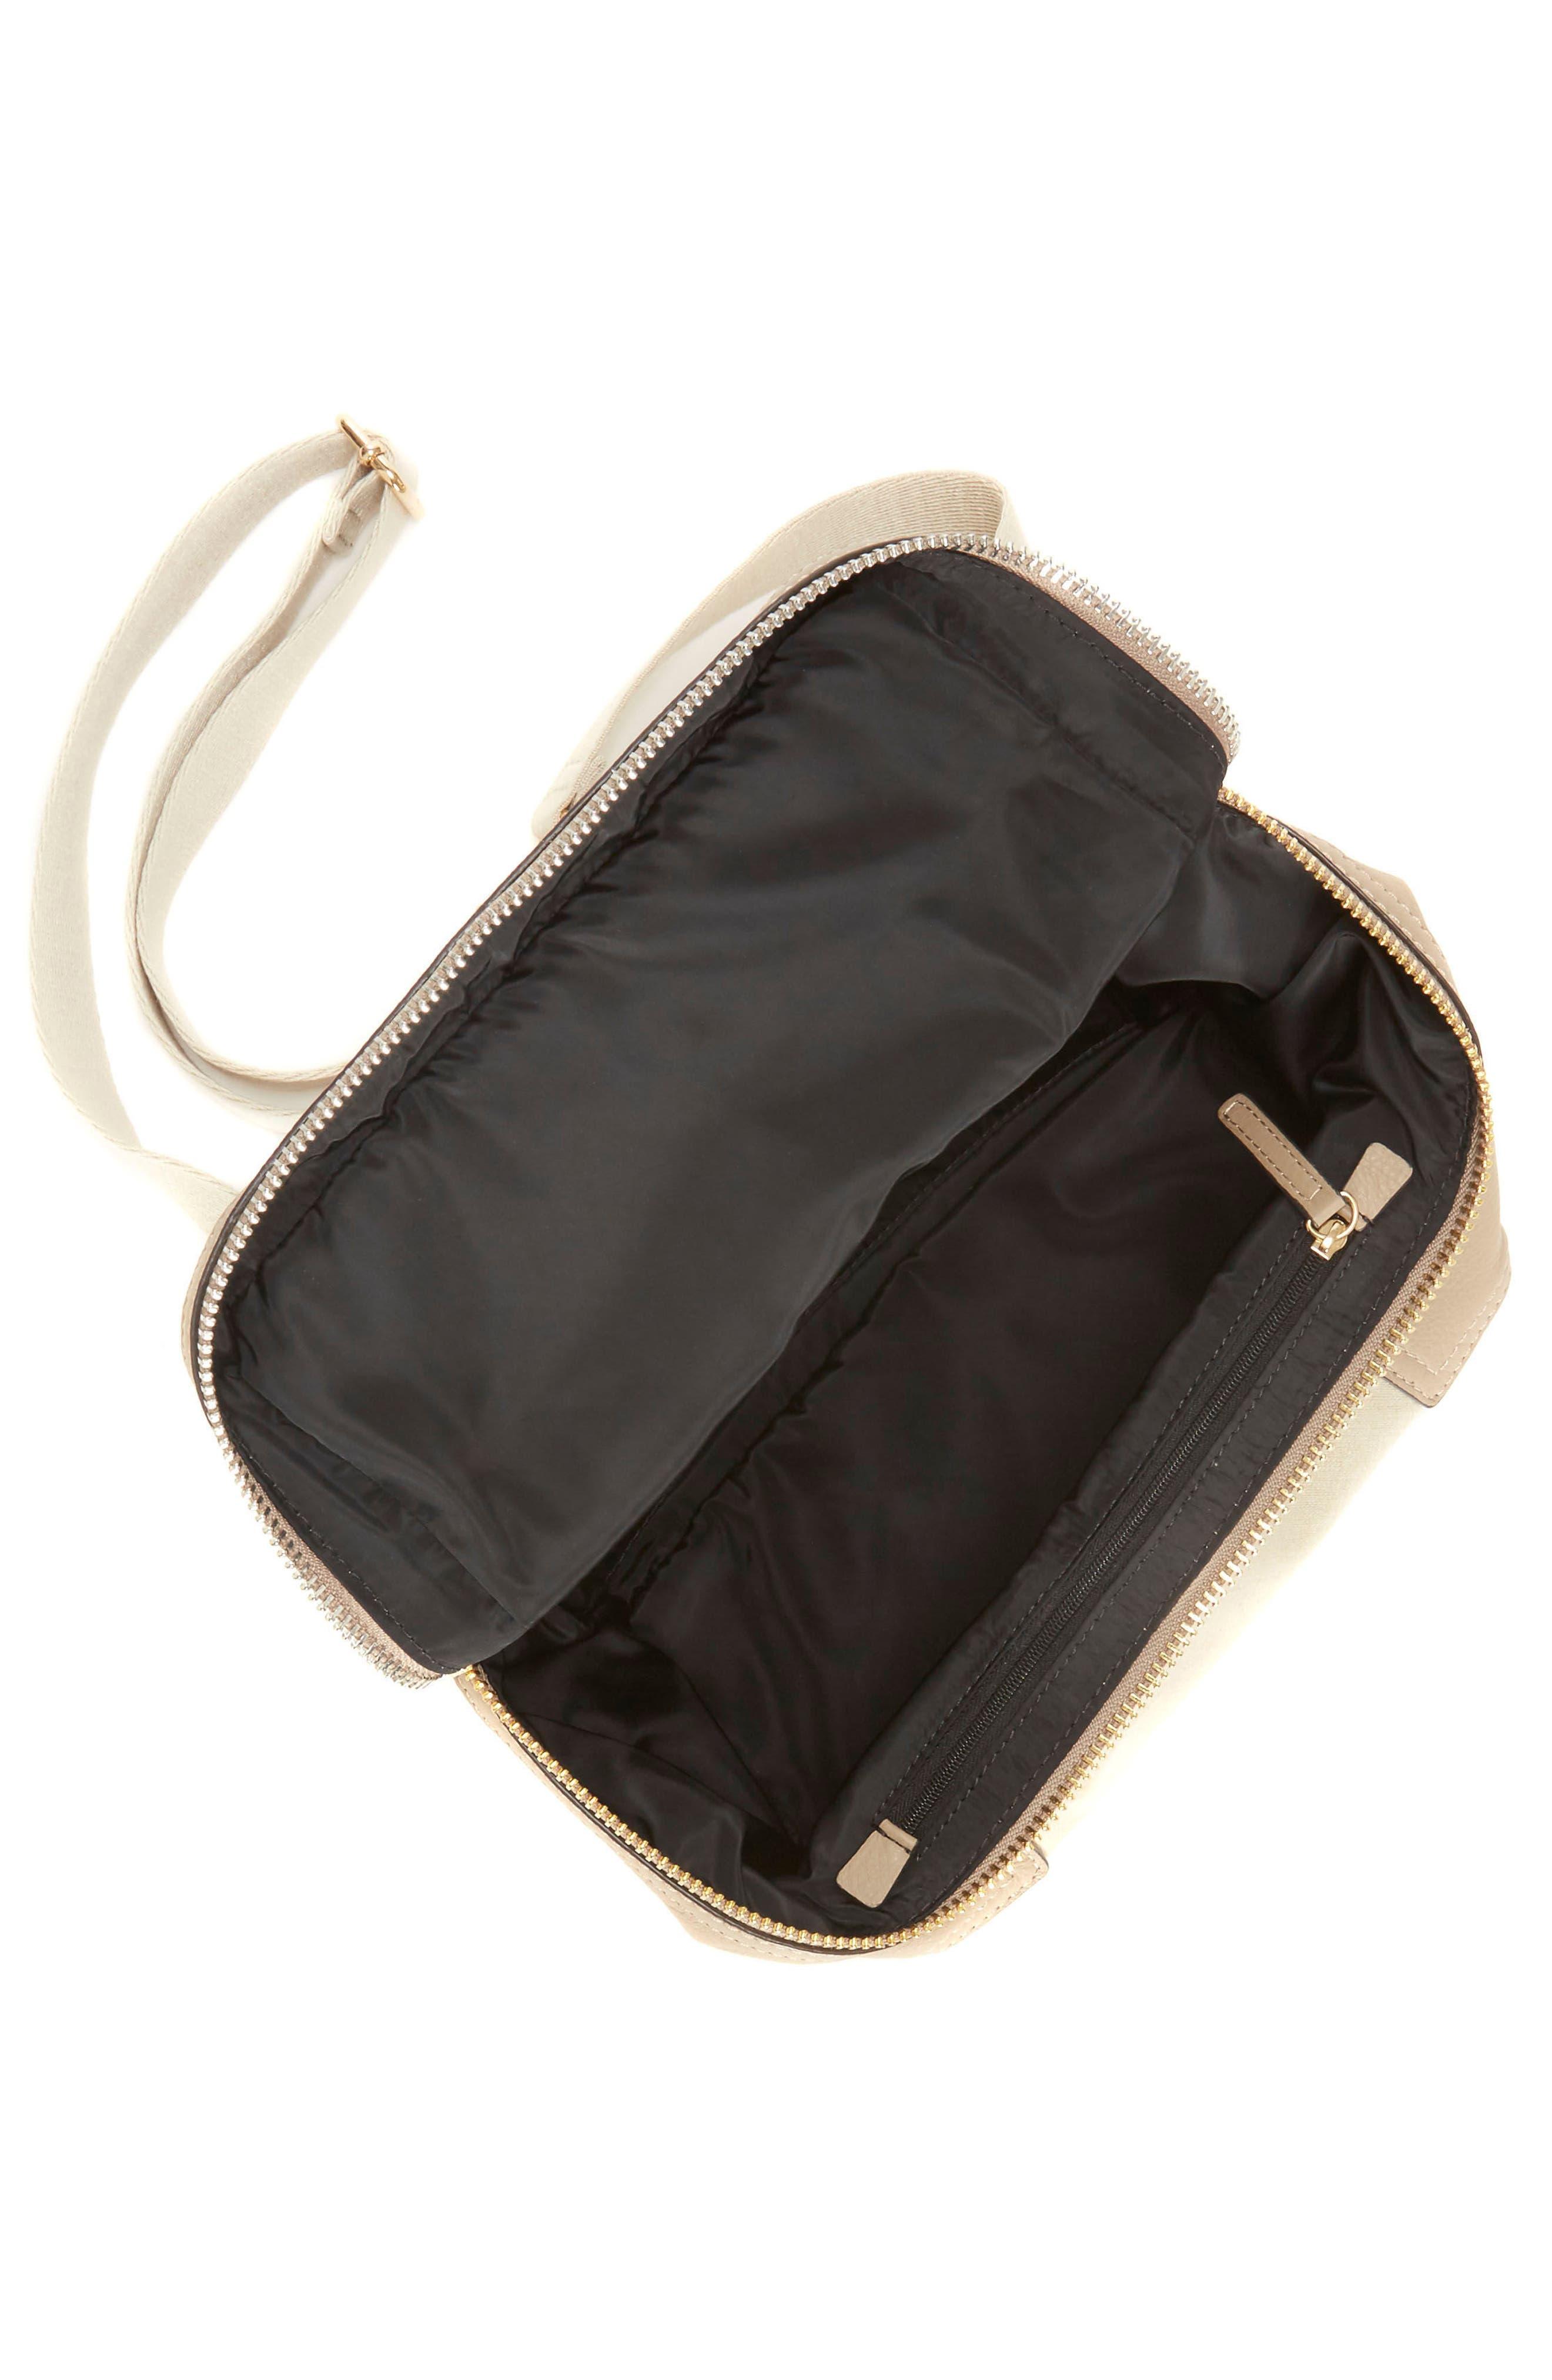 Medium Patch Nylon & Leather Crossbody Bag,                             Alternate thumbnail 3, color,                             Gold